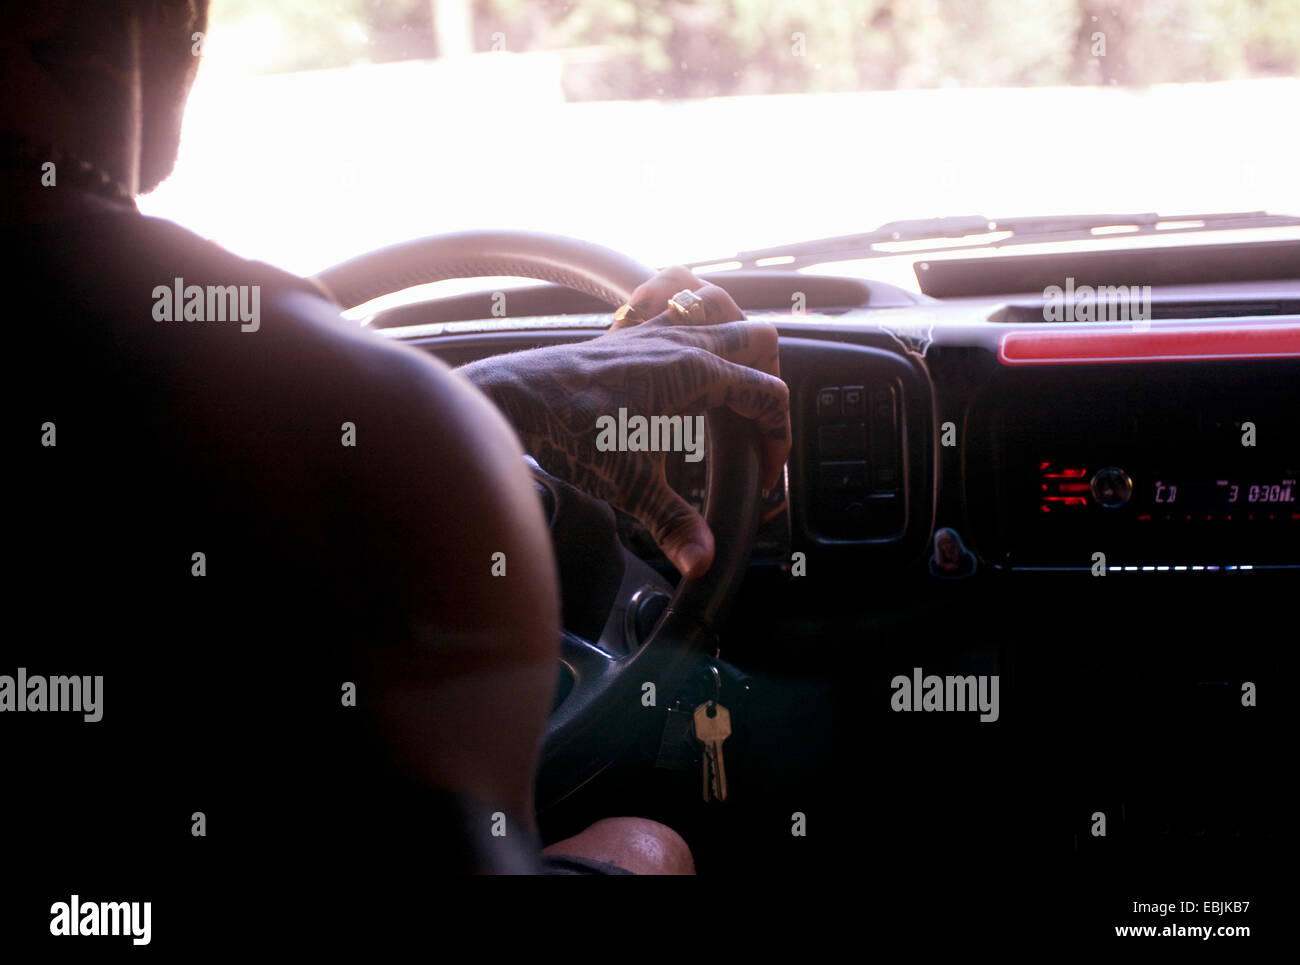 Recorta cerca de joven conduciendo coches Road Trip. Imagen De Stock